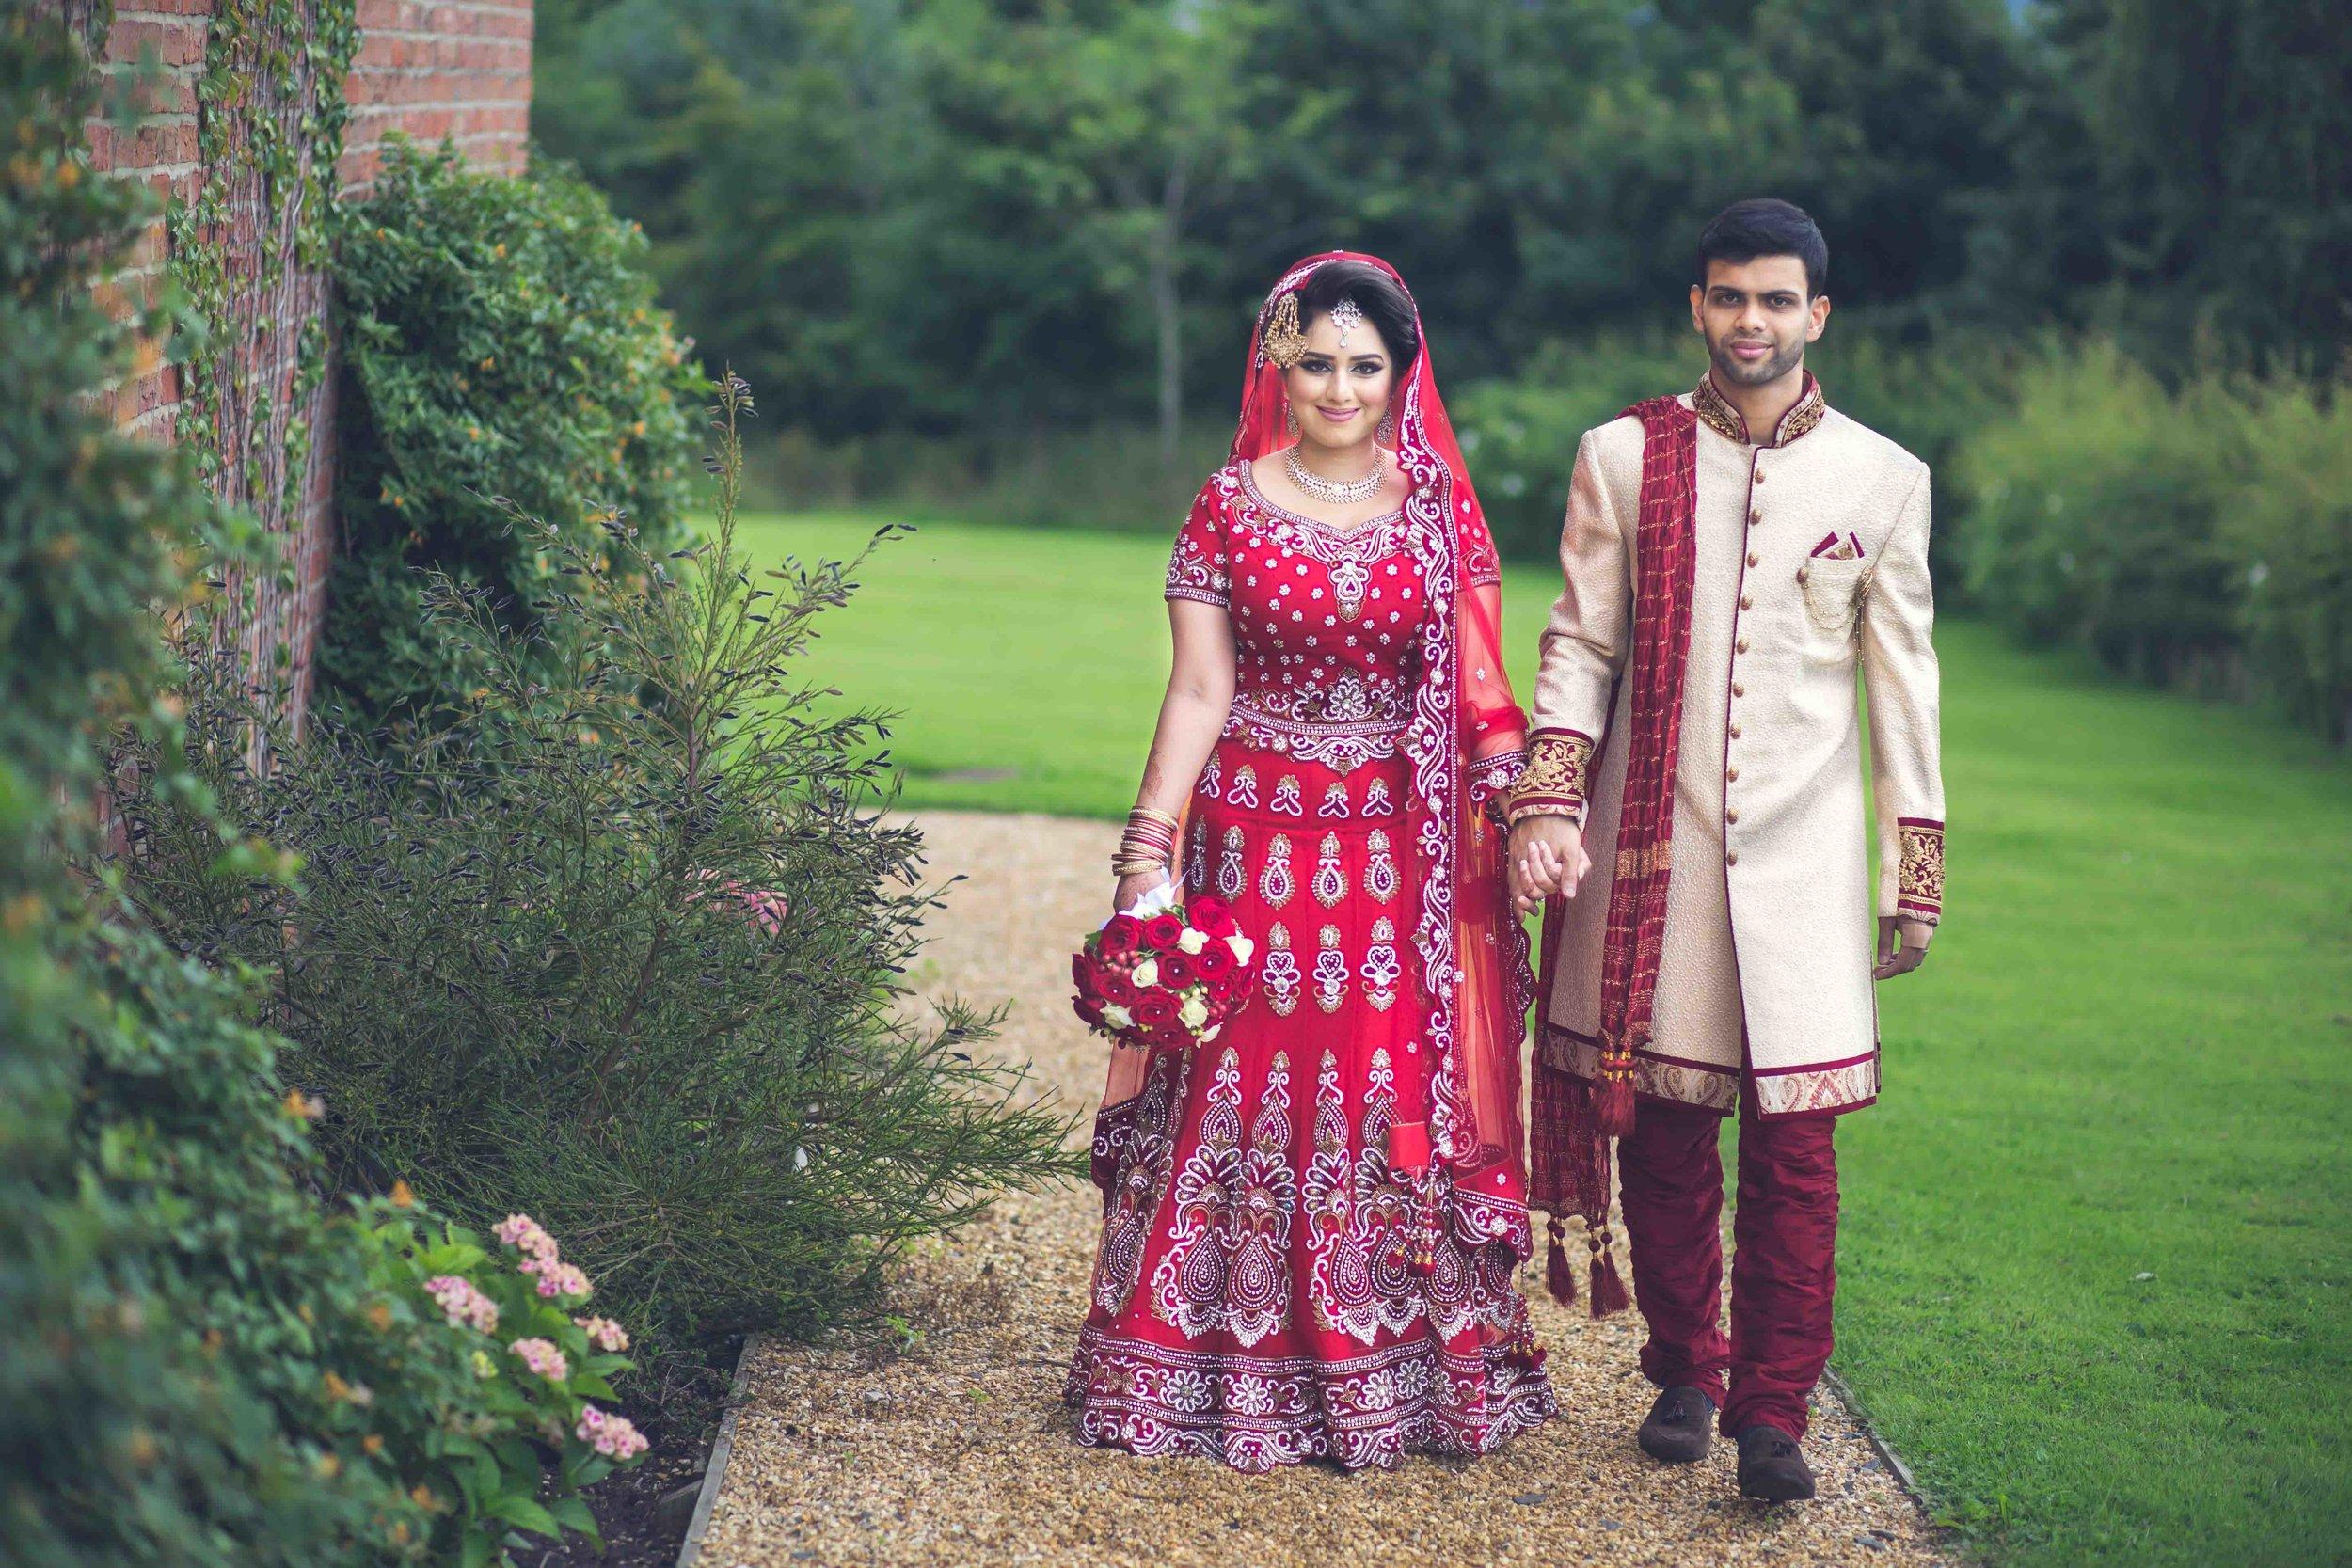 Asian Wedding Photographer Opu Sultan Photography Lyme Park Scotland Edinburgh Glasgow London Manchester Liverpool Birmingham Wedding Photos prewed shoot Jams & Tams Blod-14.jpg